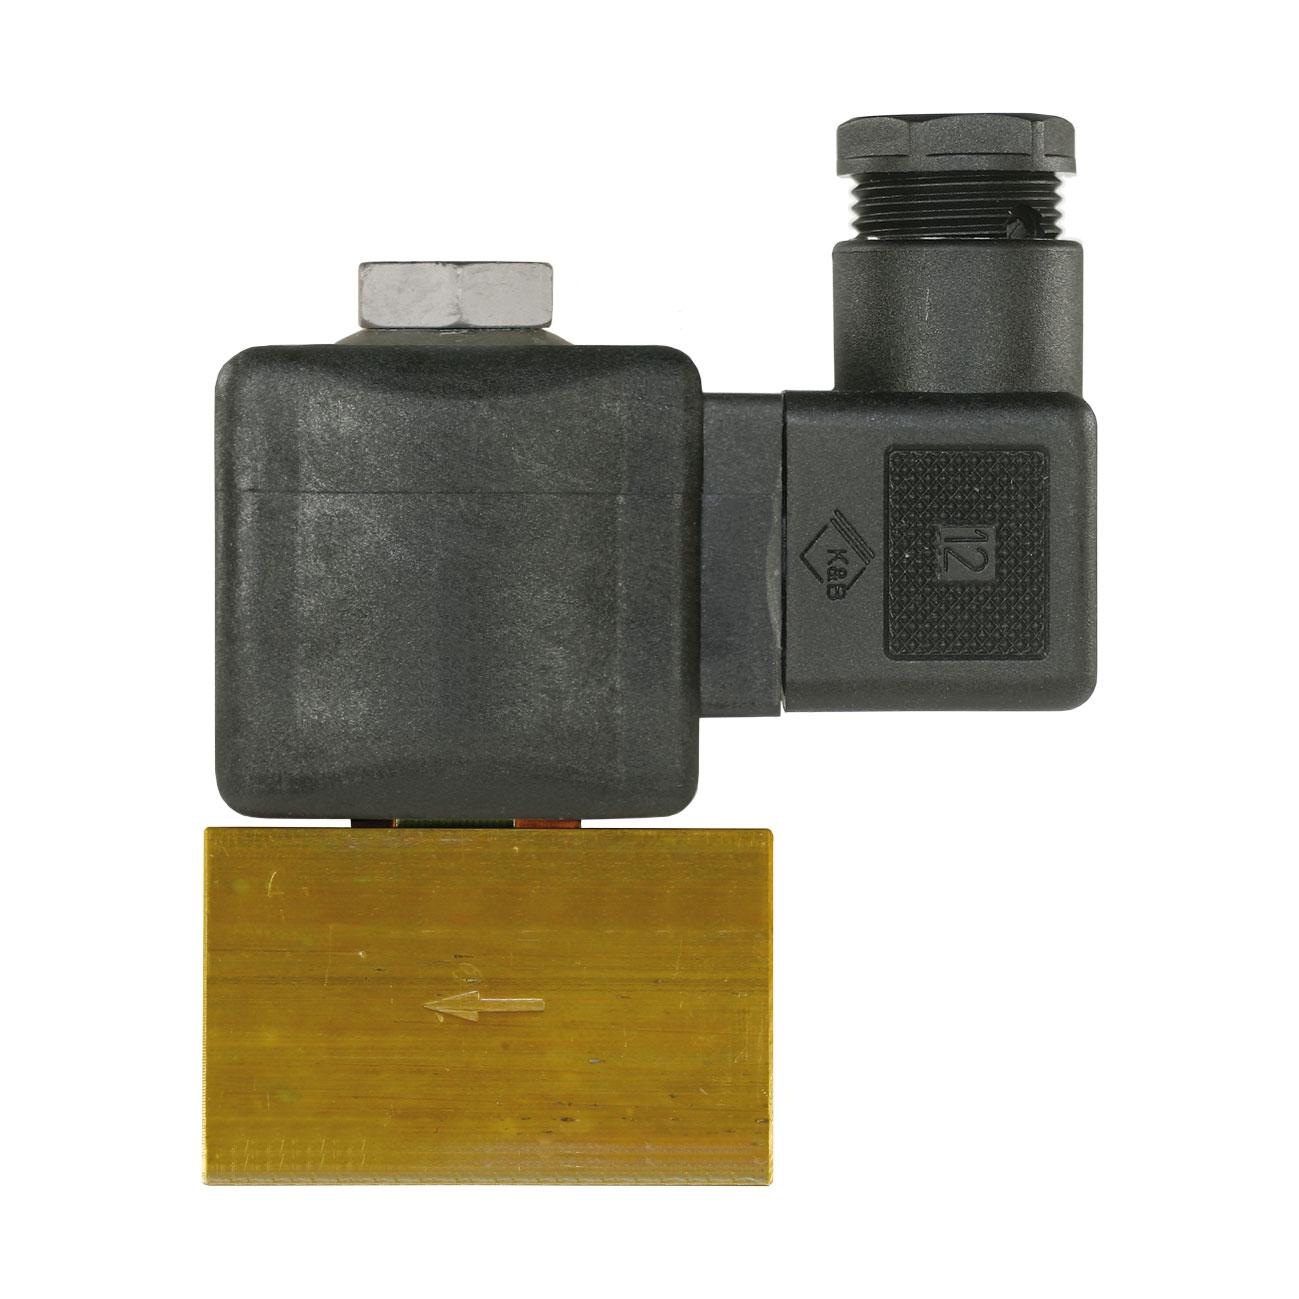 ELECTROVANNE RAPA 1/4 24V SV04 R 1.5